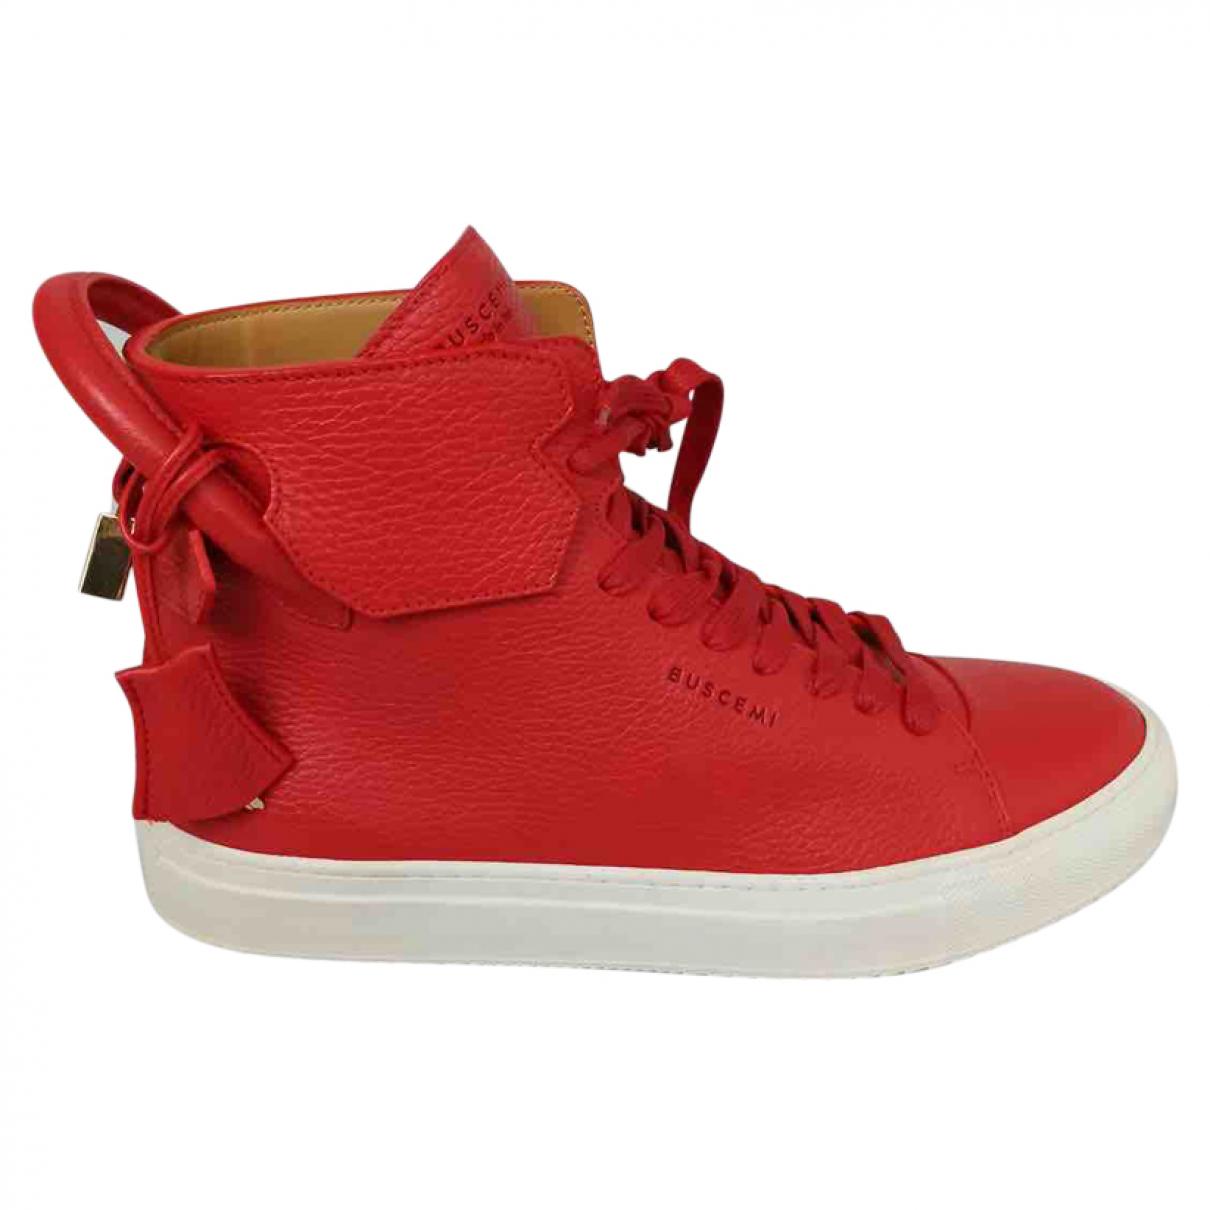 Buscemi \N Sneakers in  Rot Leder